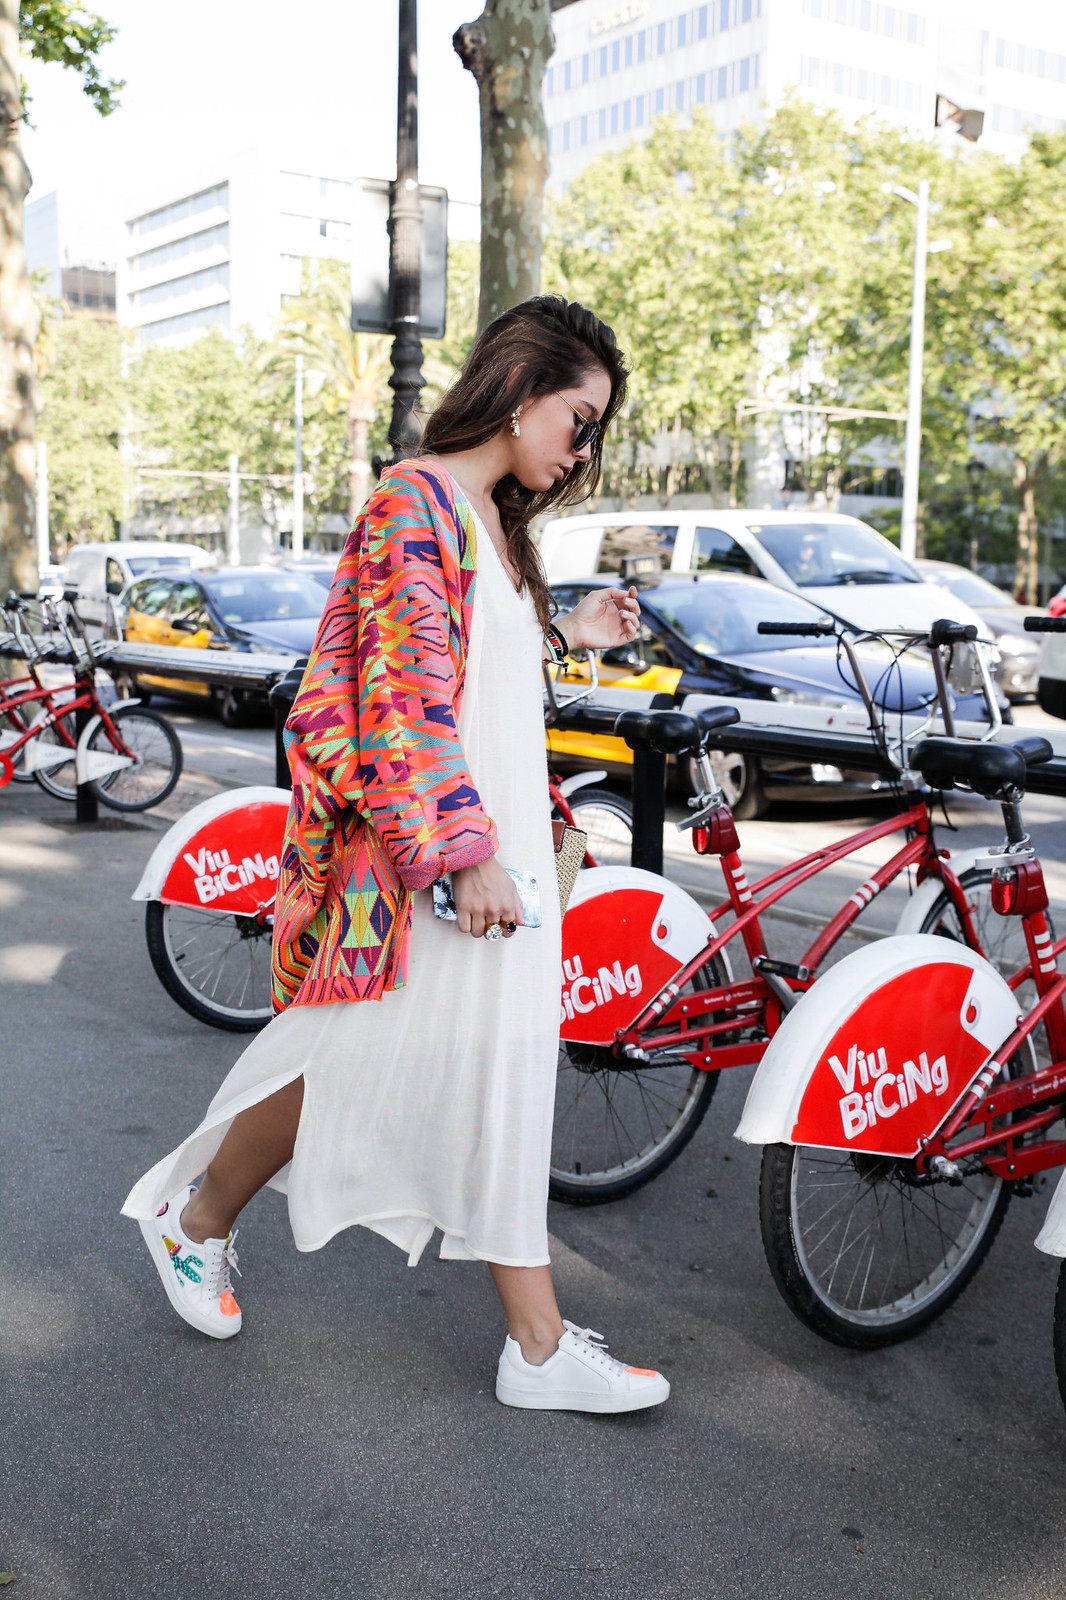 010_kimono_look_street_style_barcelona_theguestgirl_pepe_moll_ruga_caroline_svedbom_kapten_son